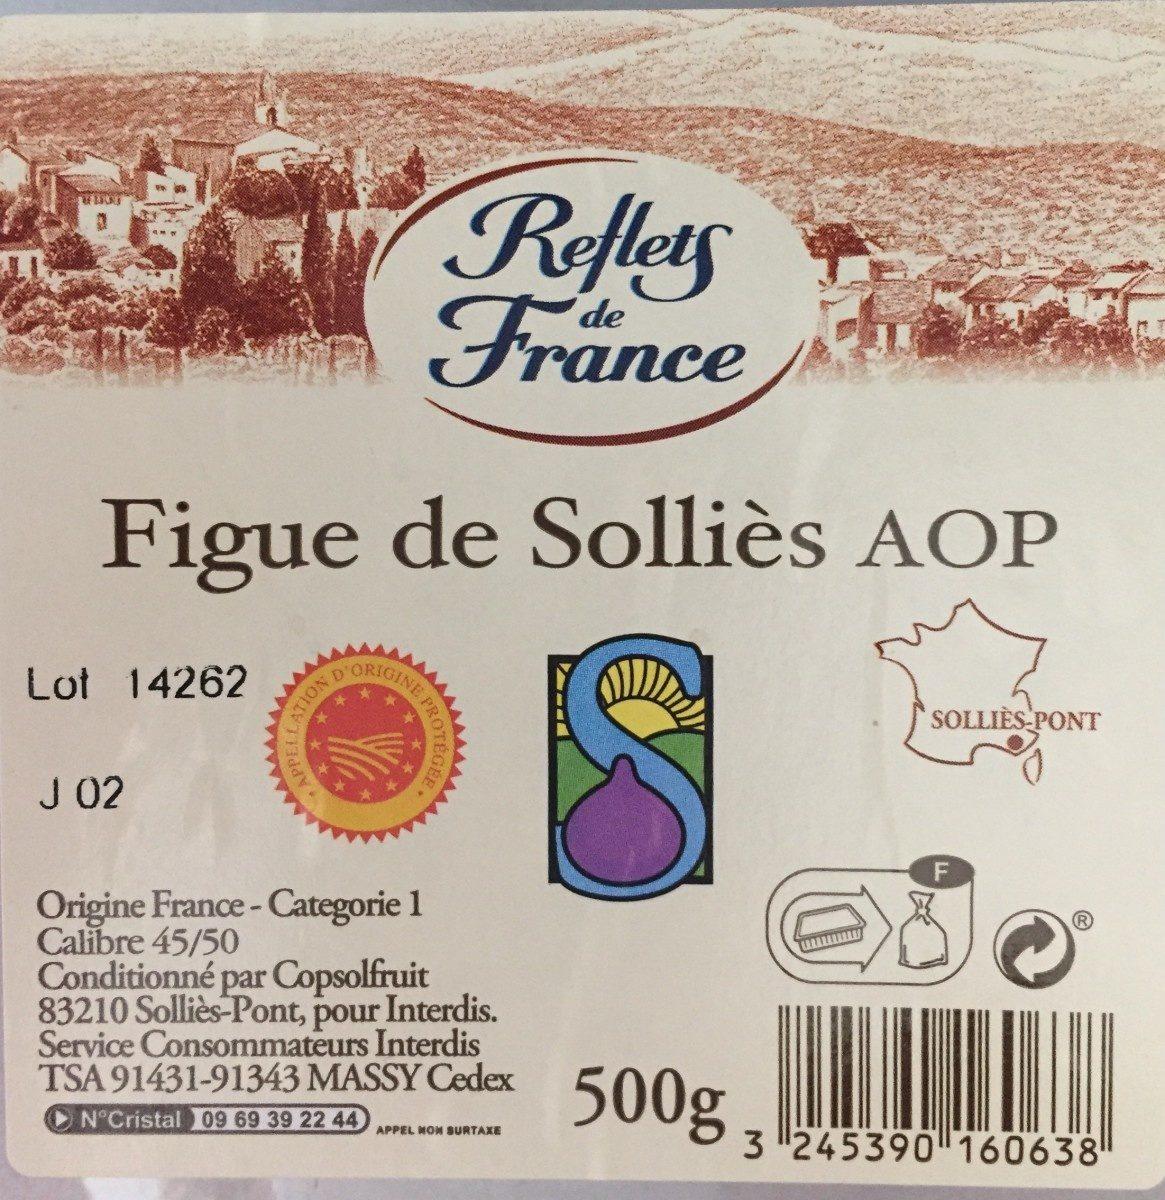 Figues de Solliès A.O.P. - Ingrediënten